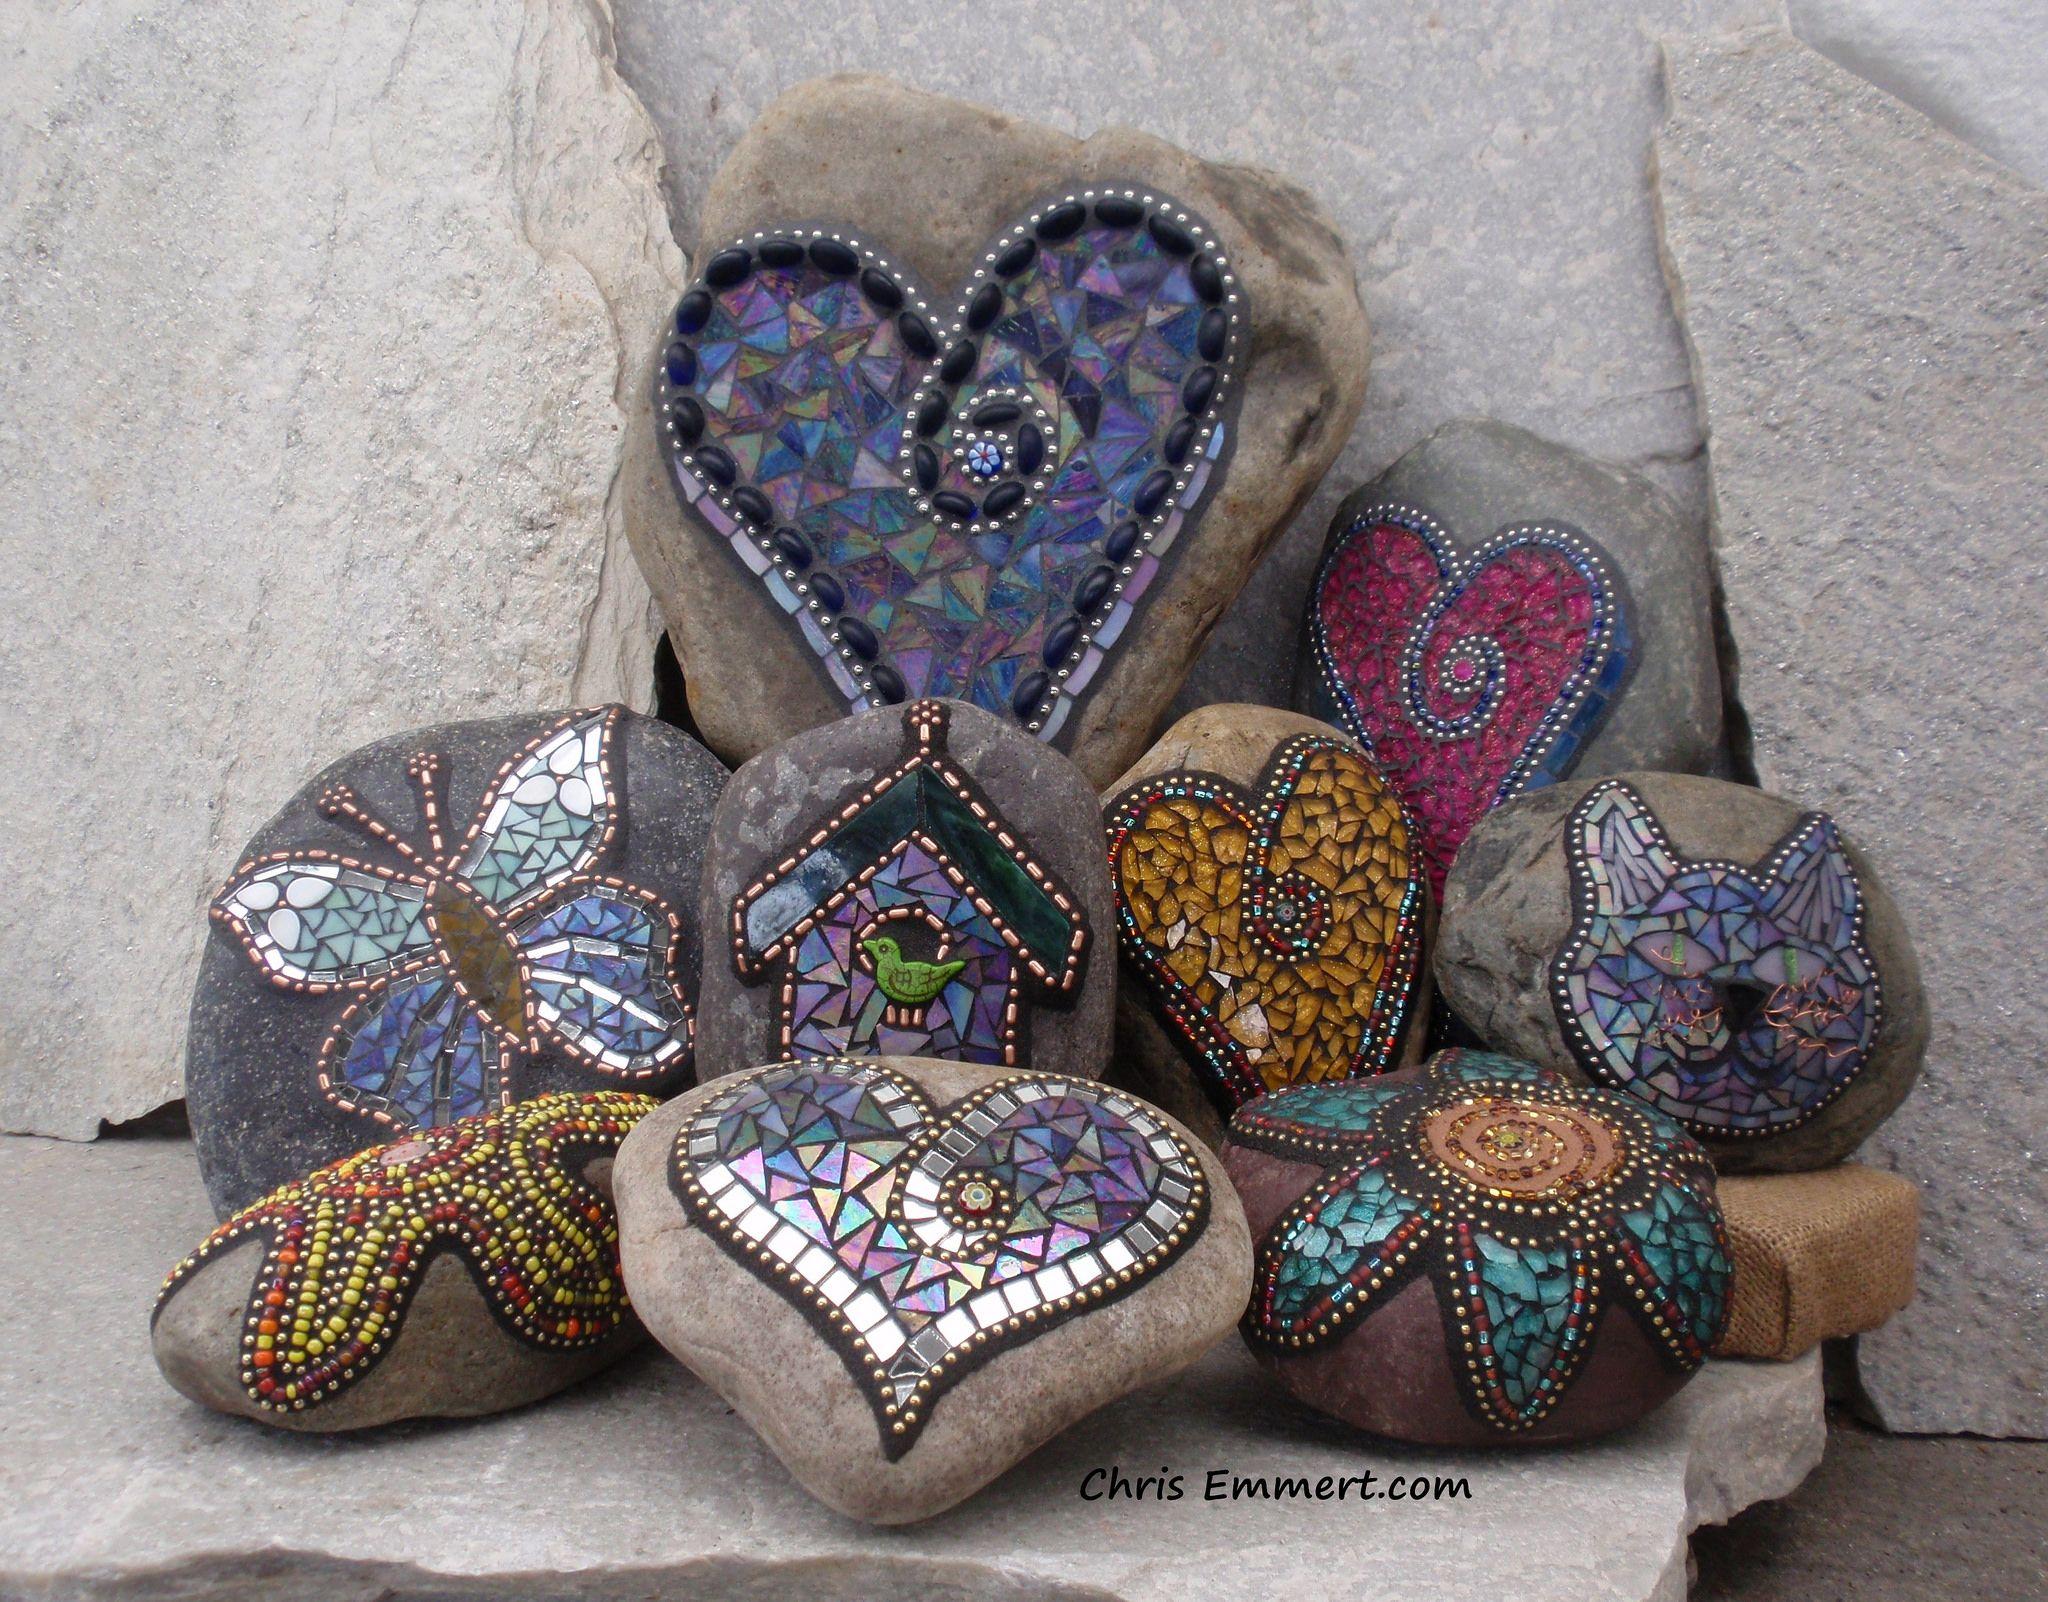 Mosaic Garden Stones | by Chris Emmert